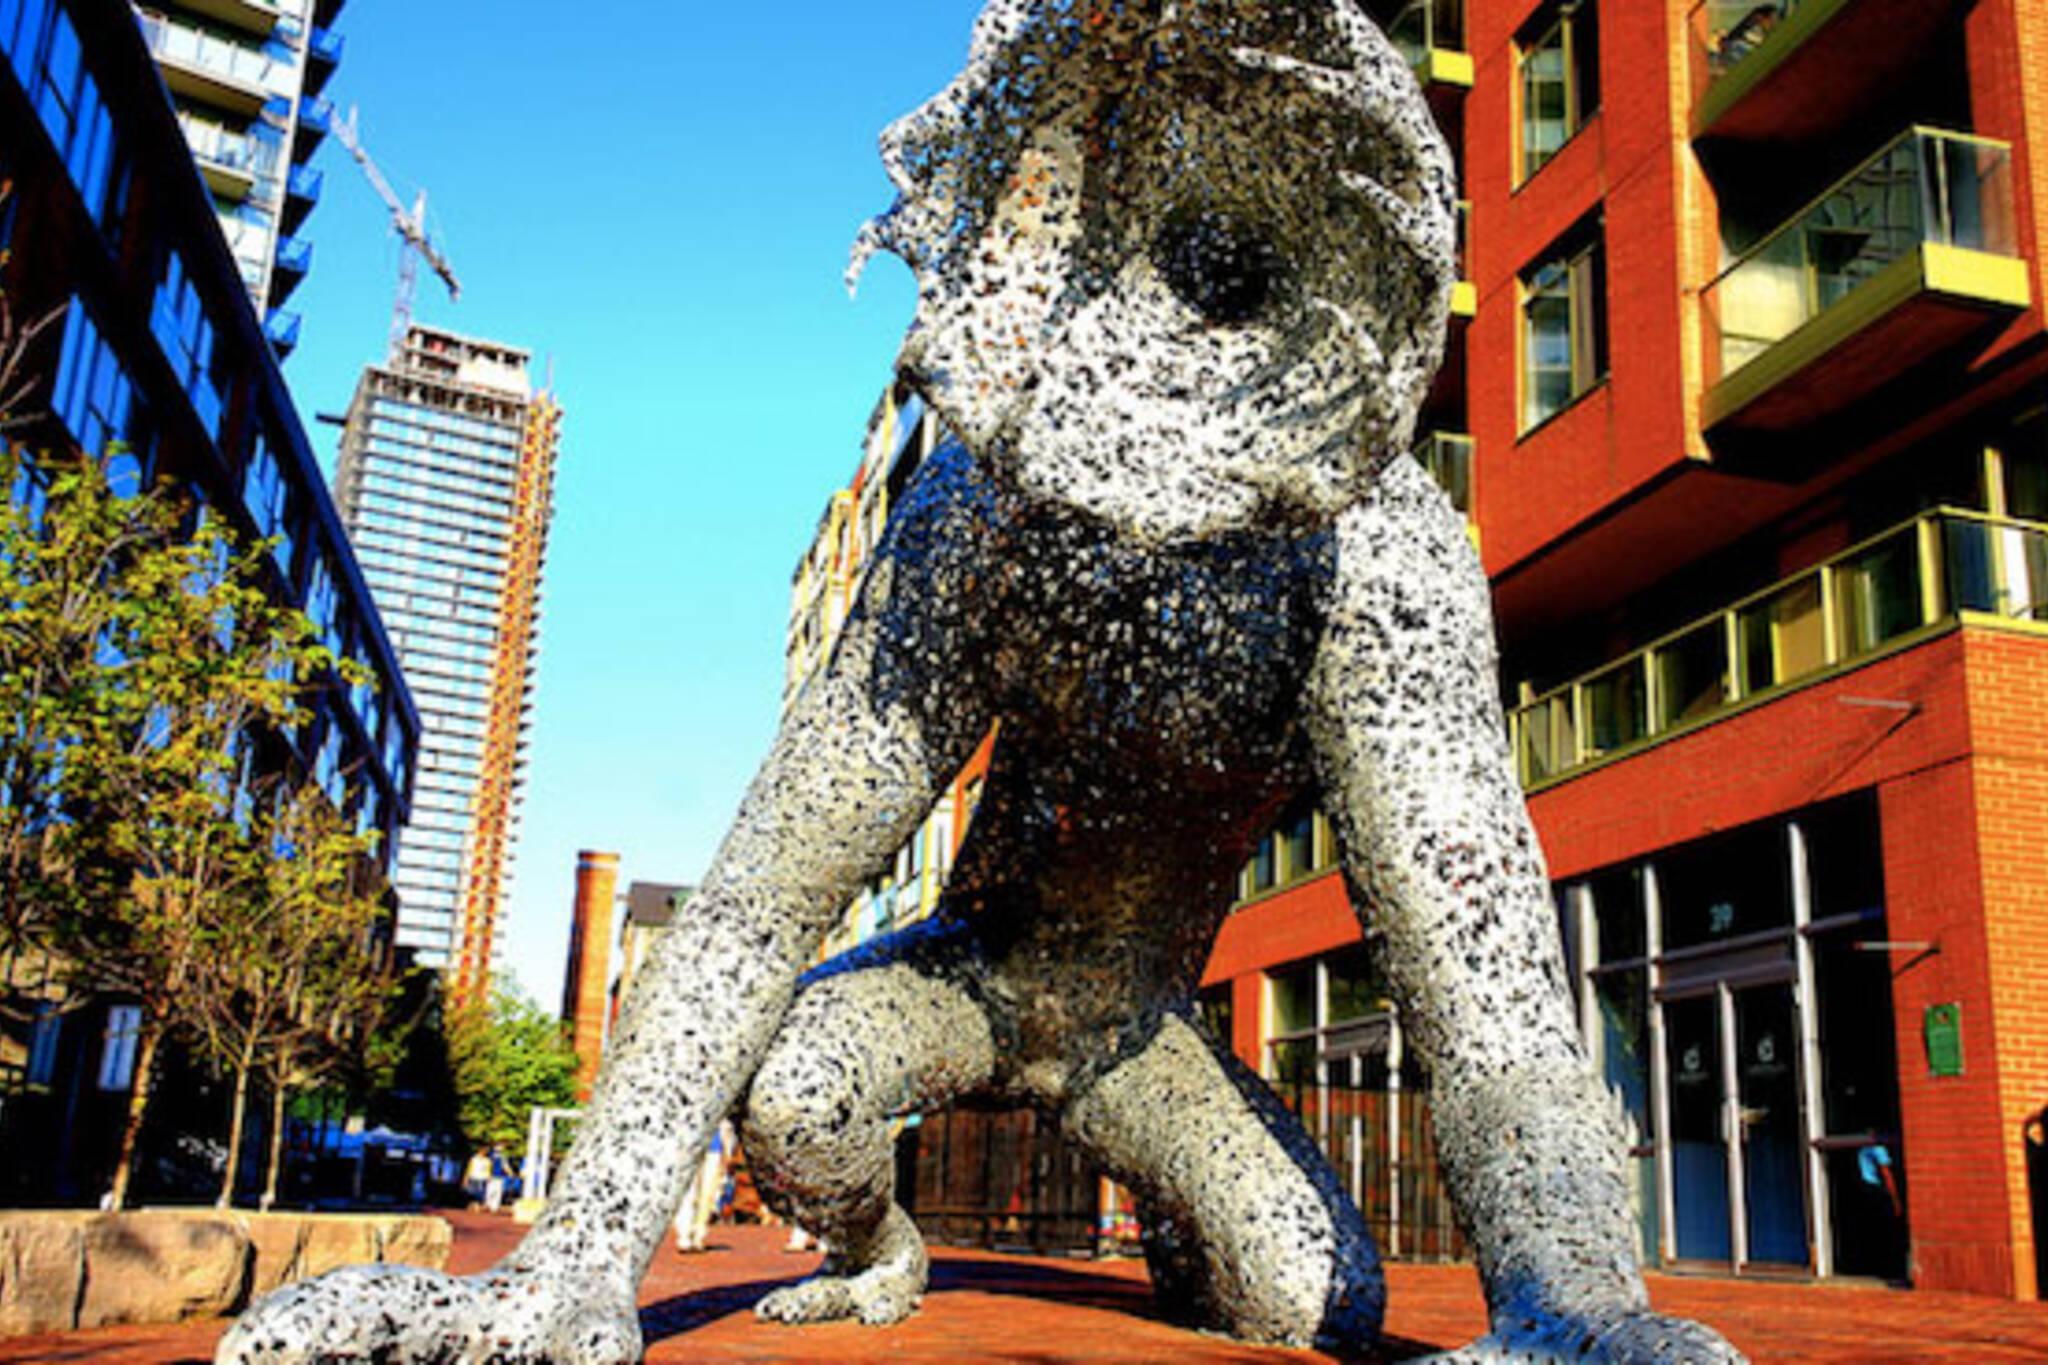 toronto distillery monster statue